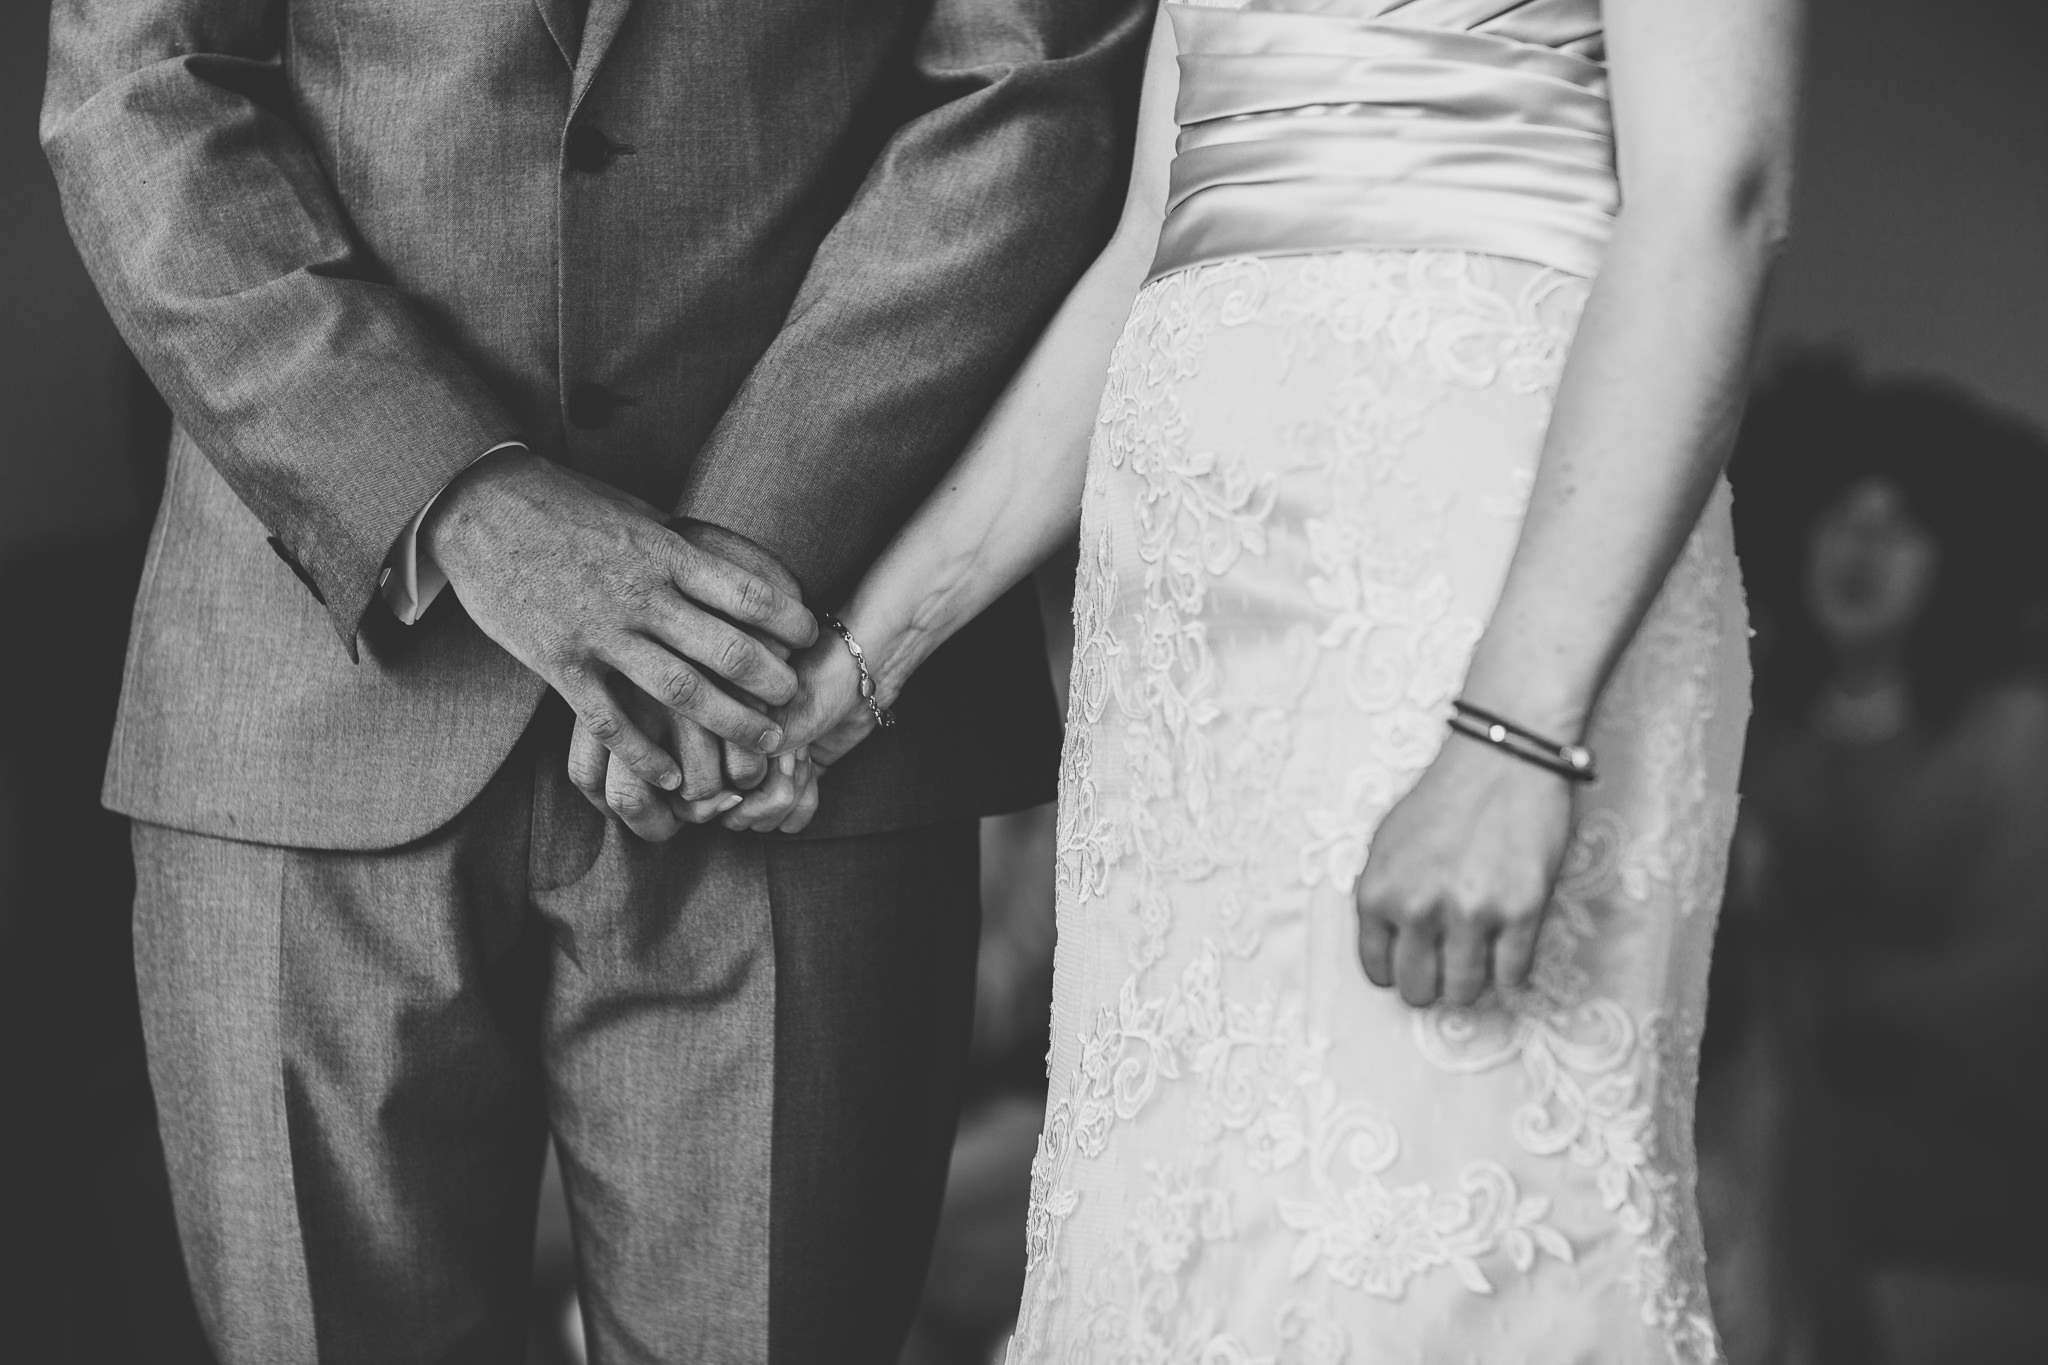 paul-marbrook-Caer-Llan-Wedding-Photographer-90038